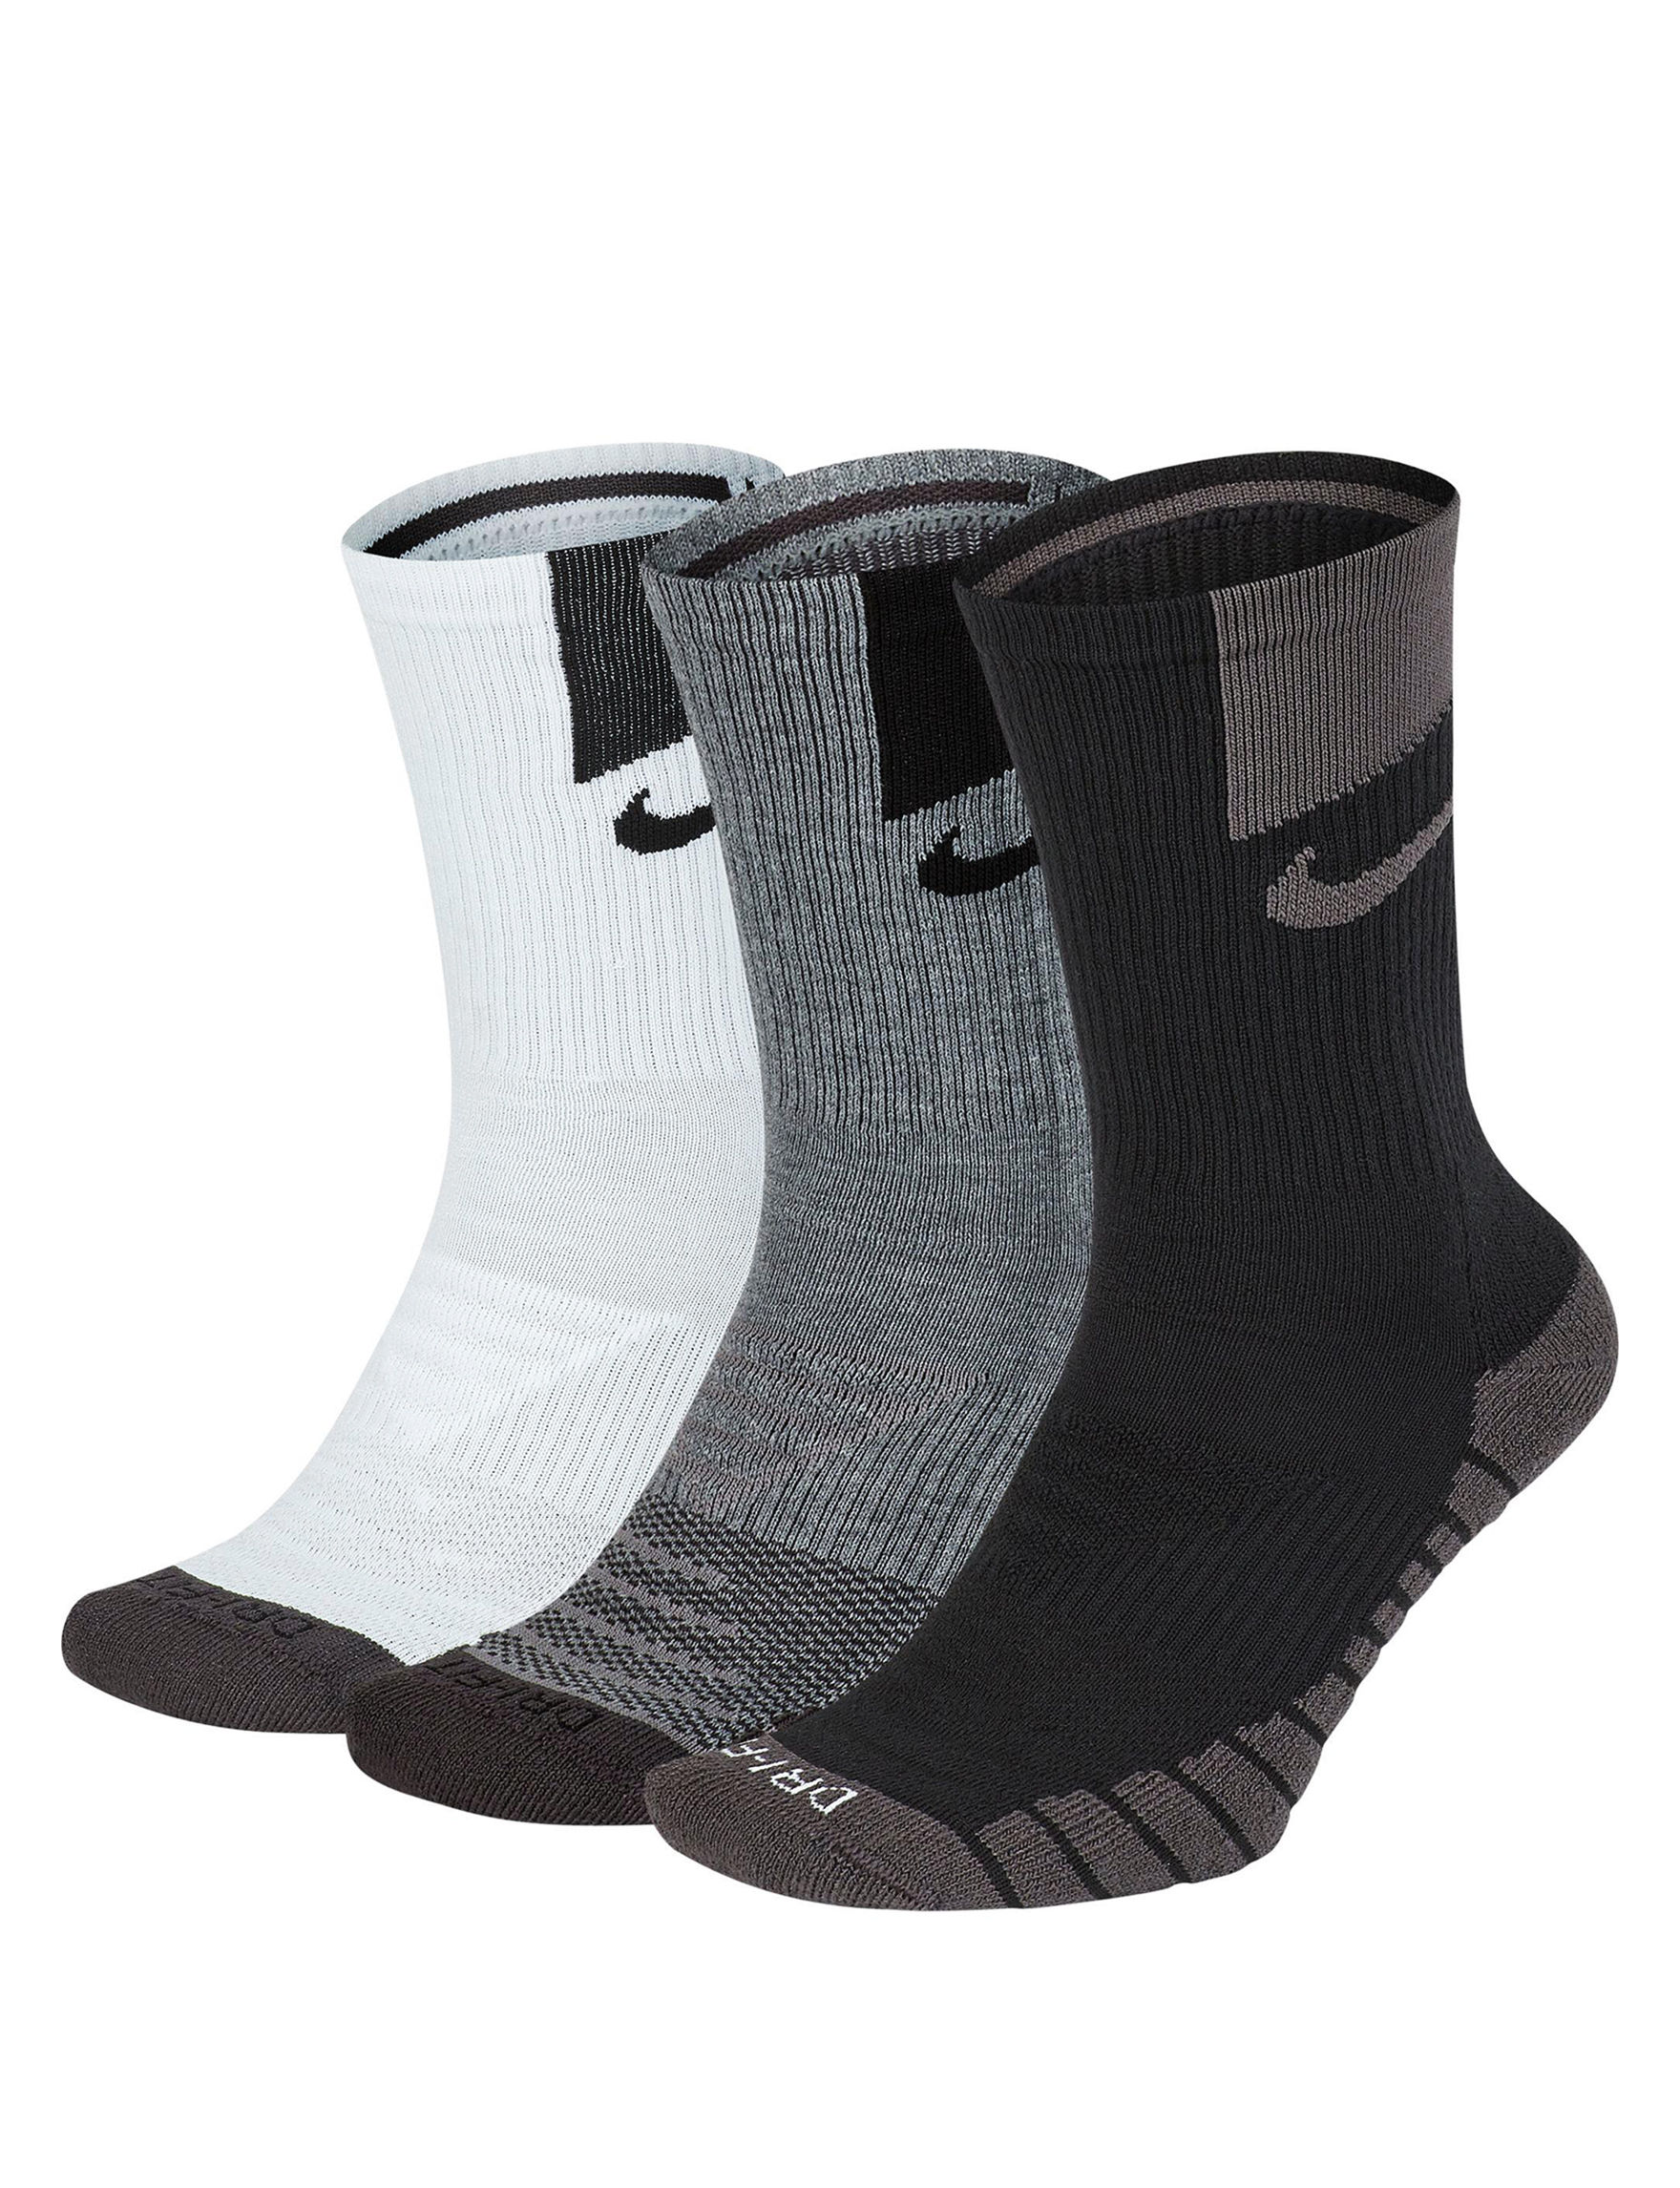 Nike Brown Multi Socks